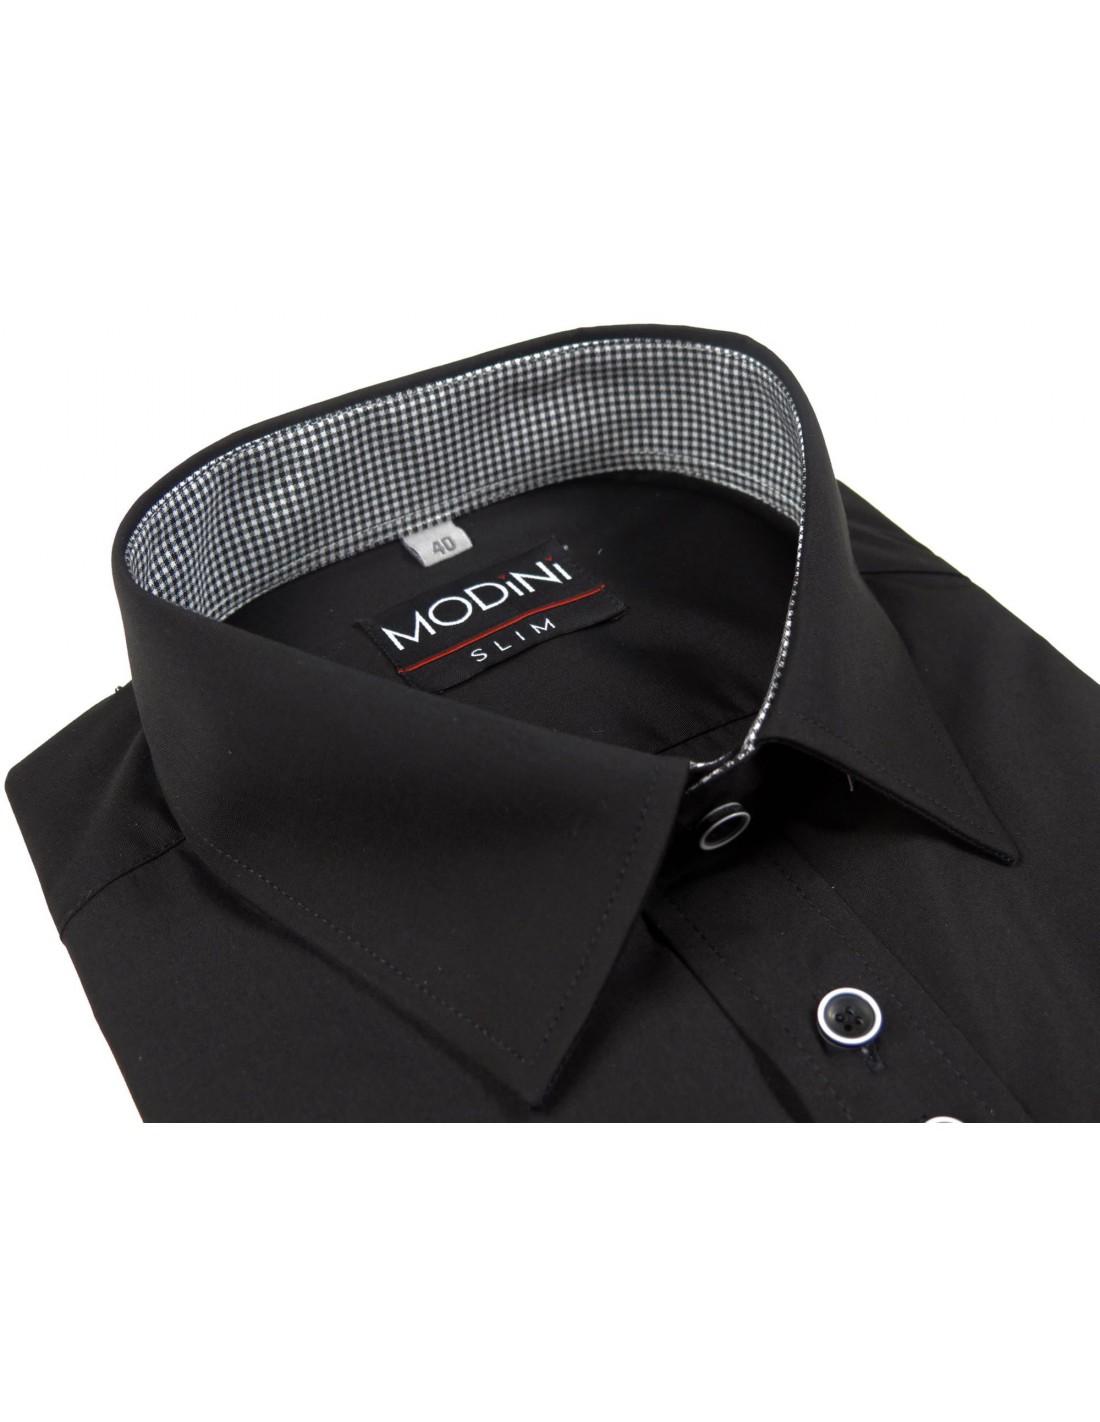 5af5020d36858 Czarna koszula męska Modini | Sklep Internetowy Modini.pl